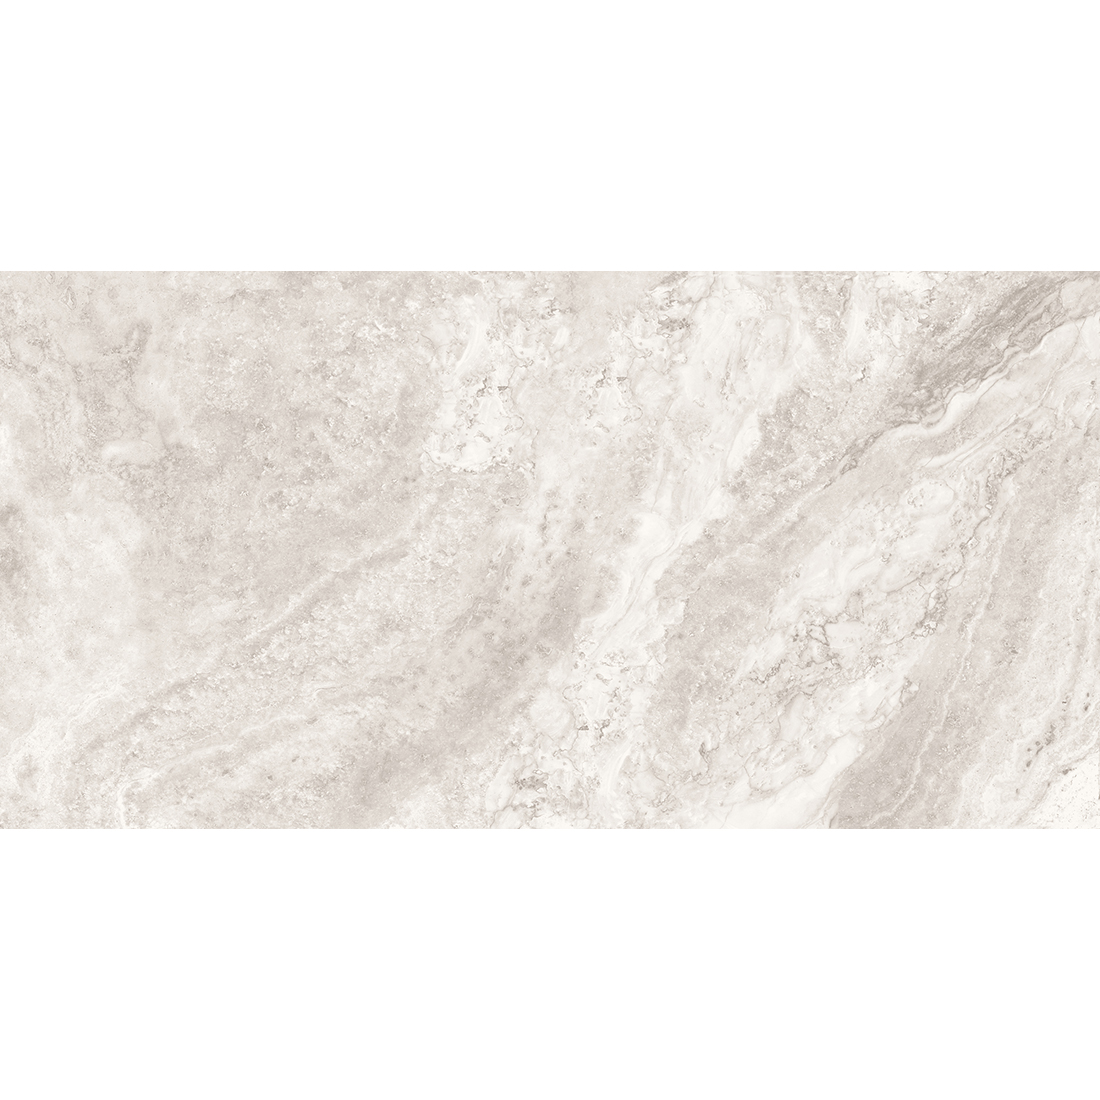 Alabastrino 30x60 Grey Gloss 1